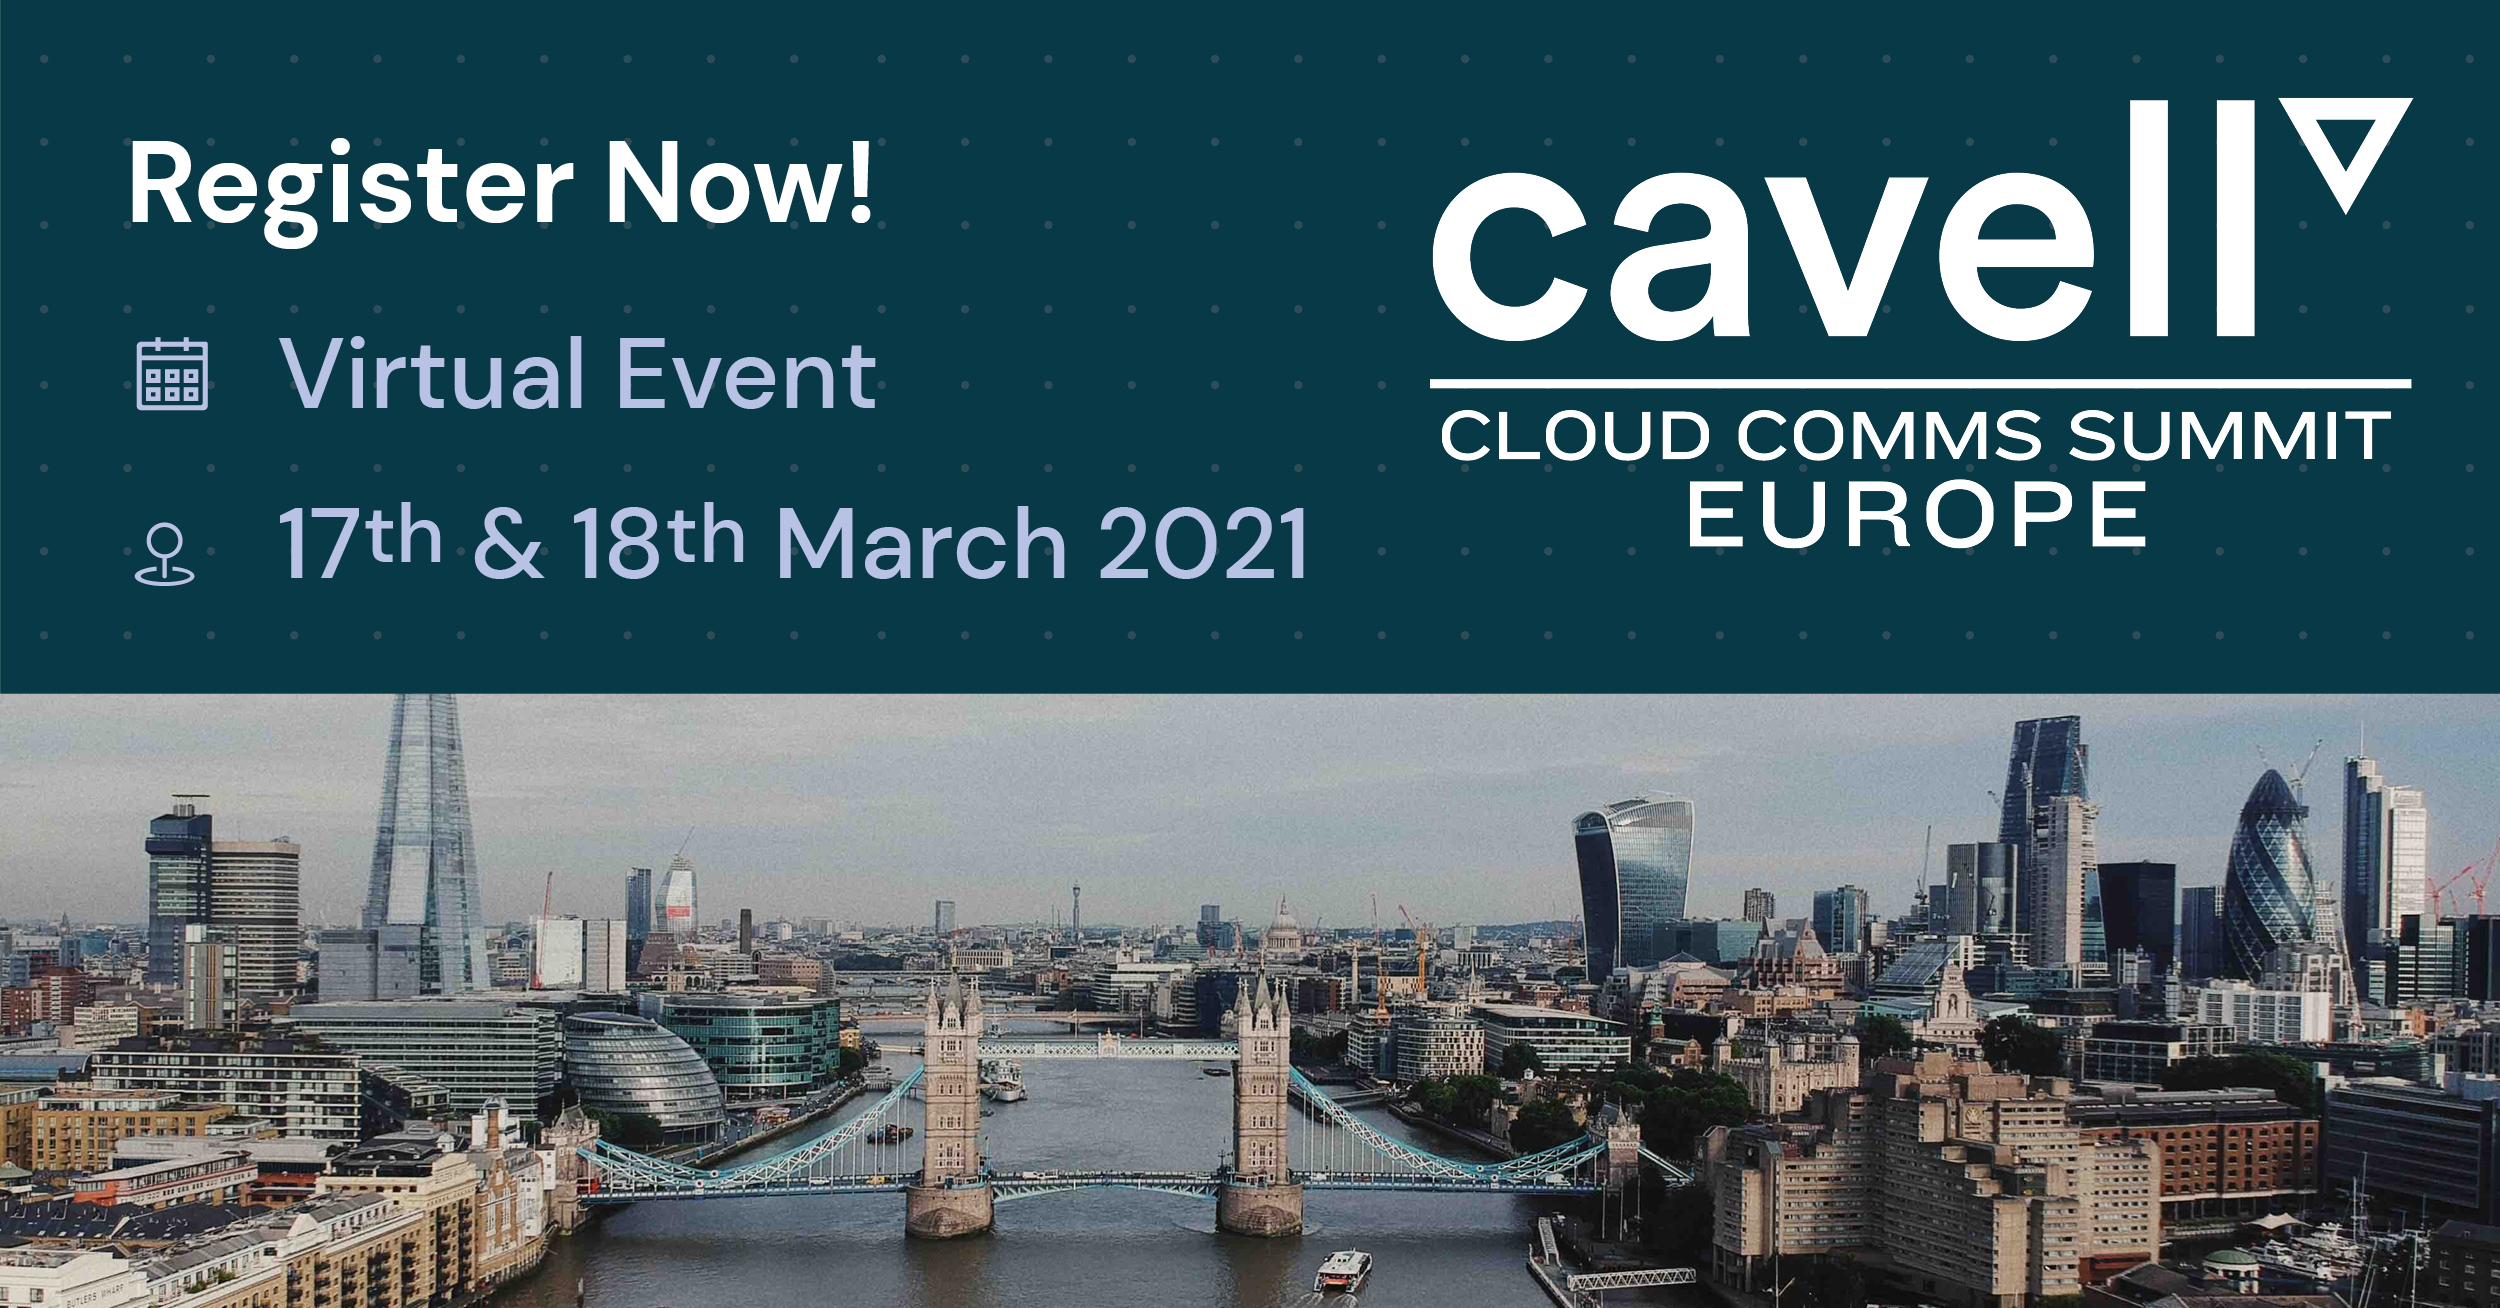 cloud comms summit europe